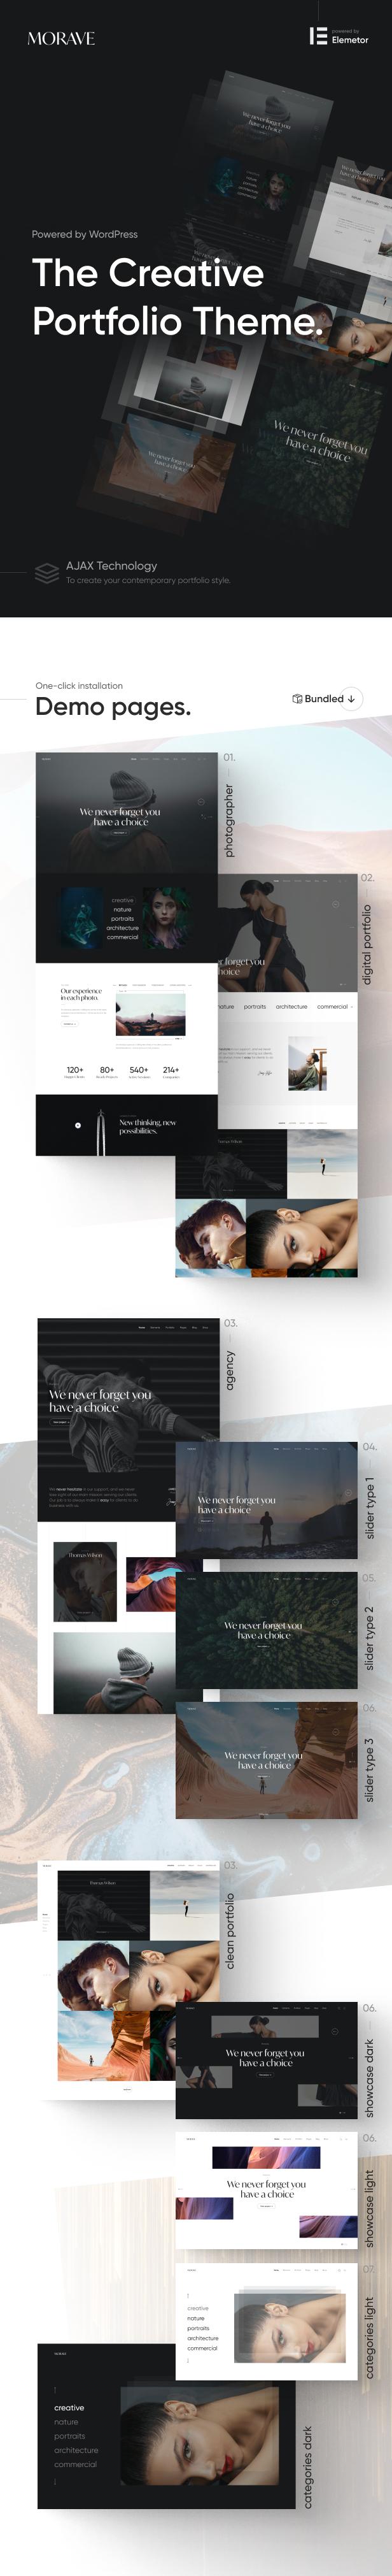 Morave - AJAX Portfolio WordPress Theme - 5